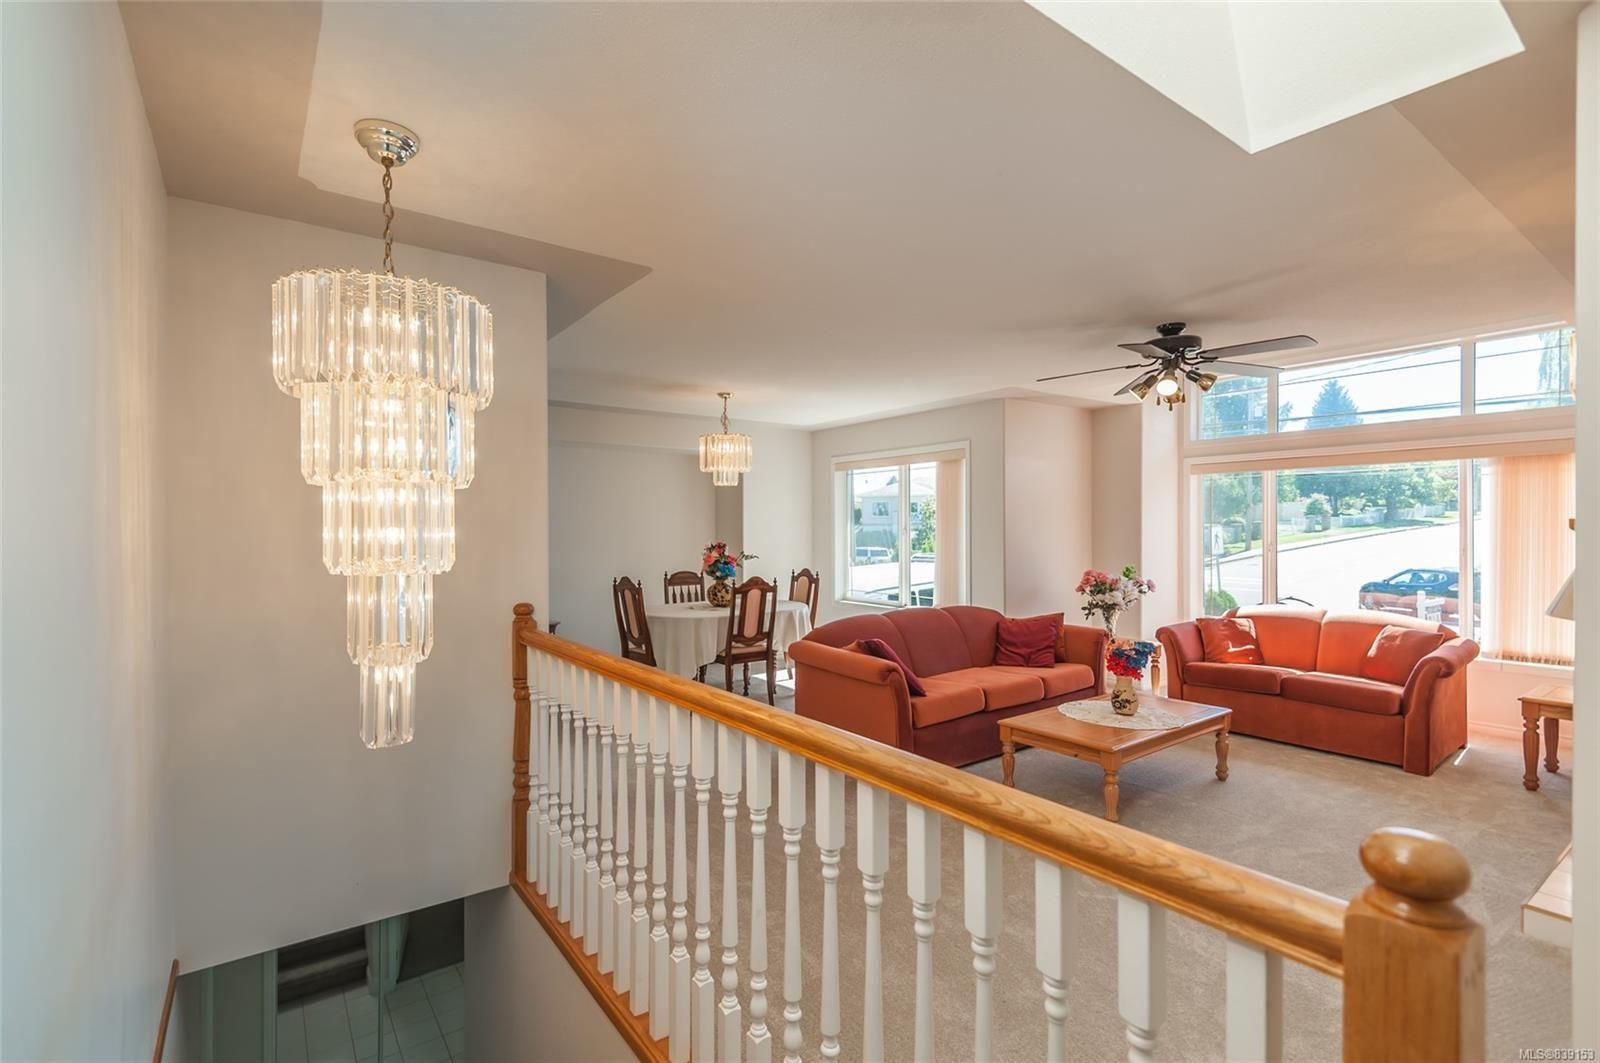 Photo 12: Photos: 6412 Dover Rd in NANAIMO: Na North Nanaimo House for sale (Nanaimo)  : MLS®# 839153